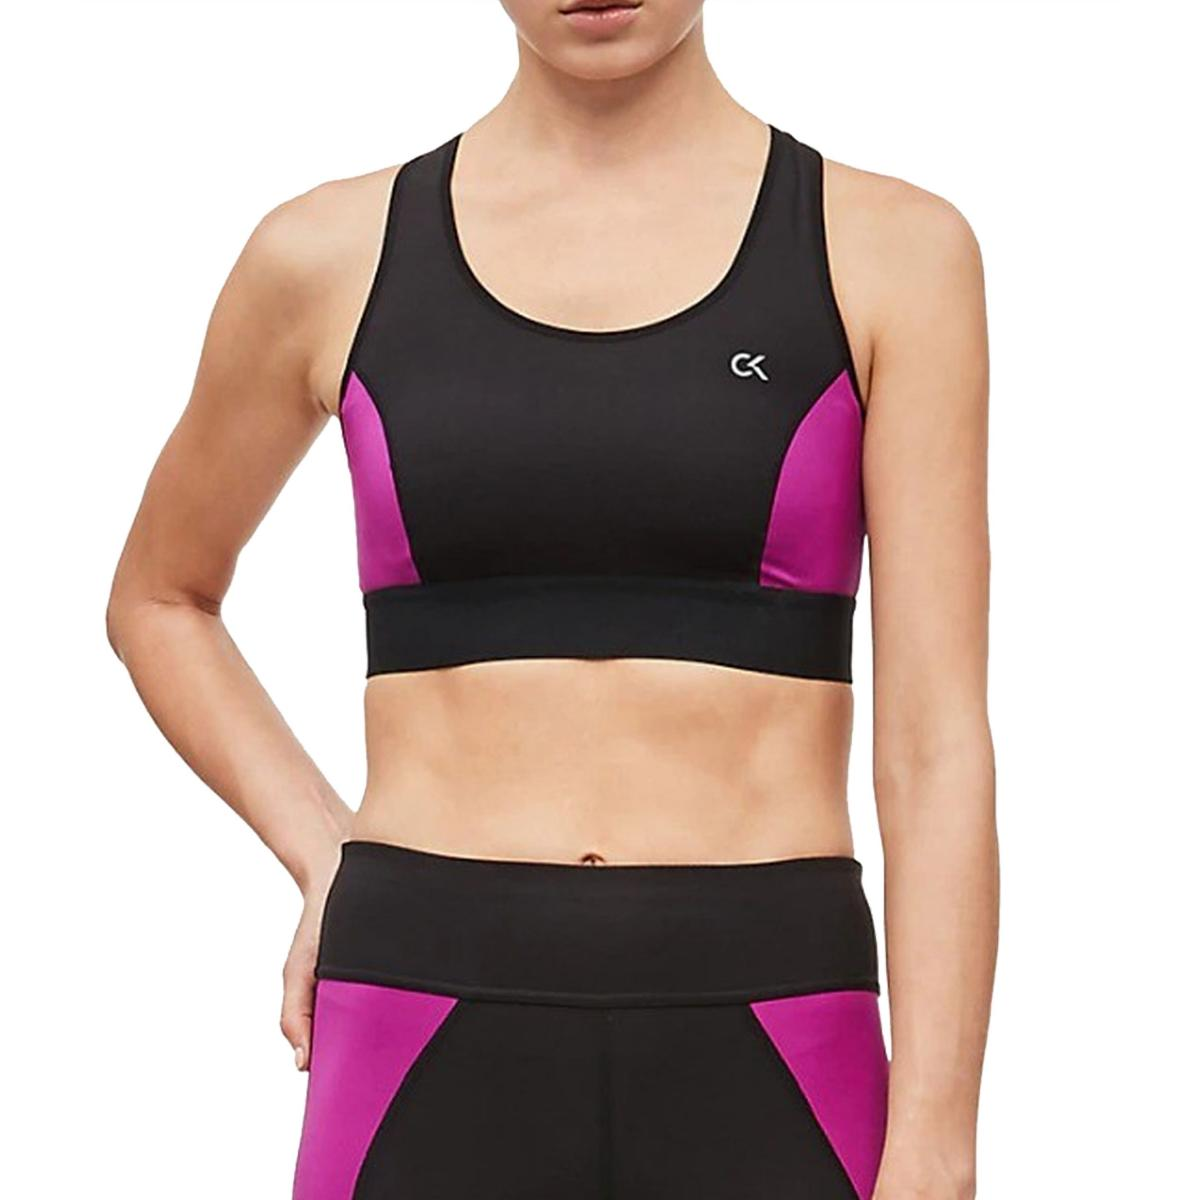 Reggiseno sportivo Calvin Klein Performance stile olimpionico donna rif. 00GWF9K180